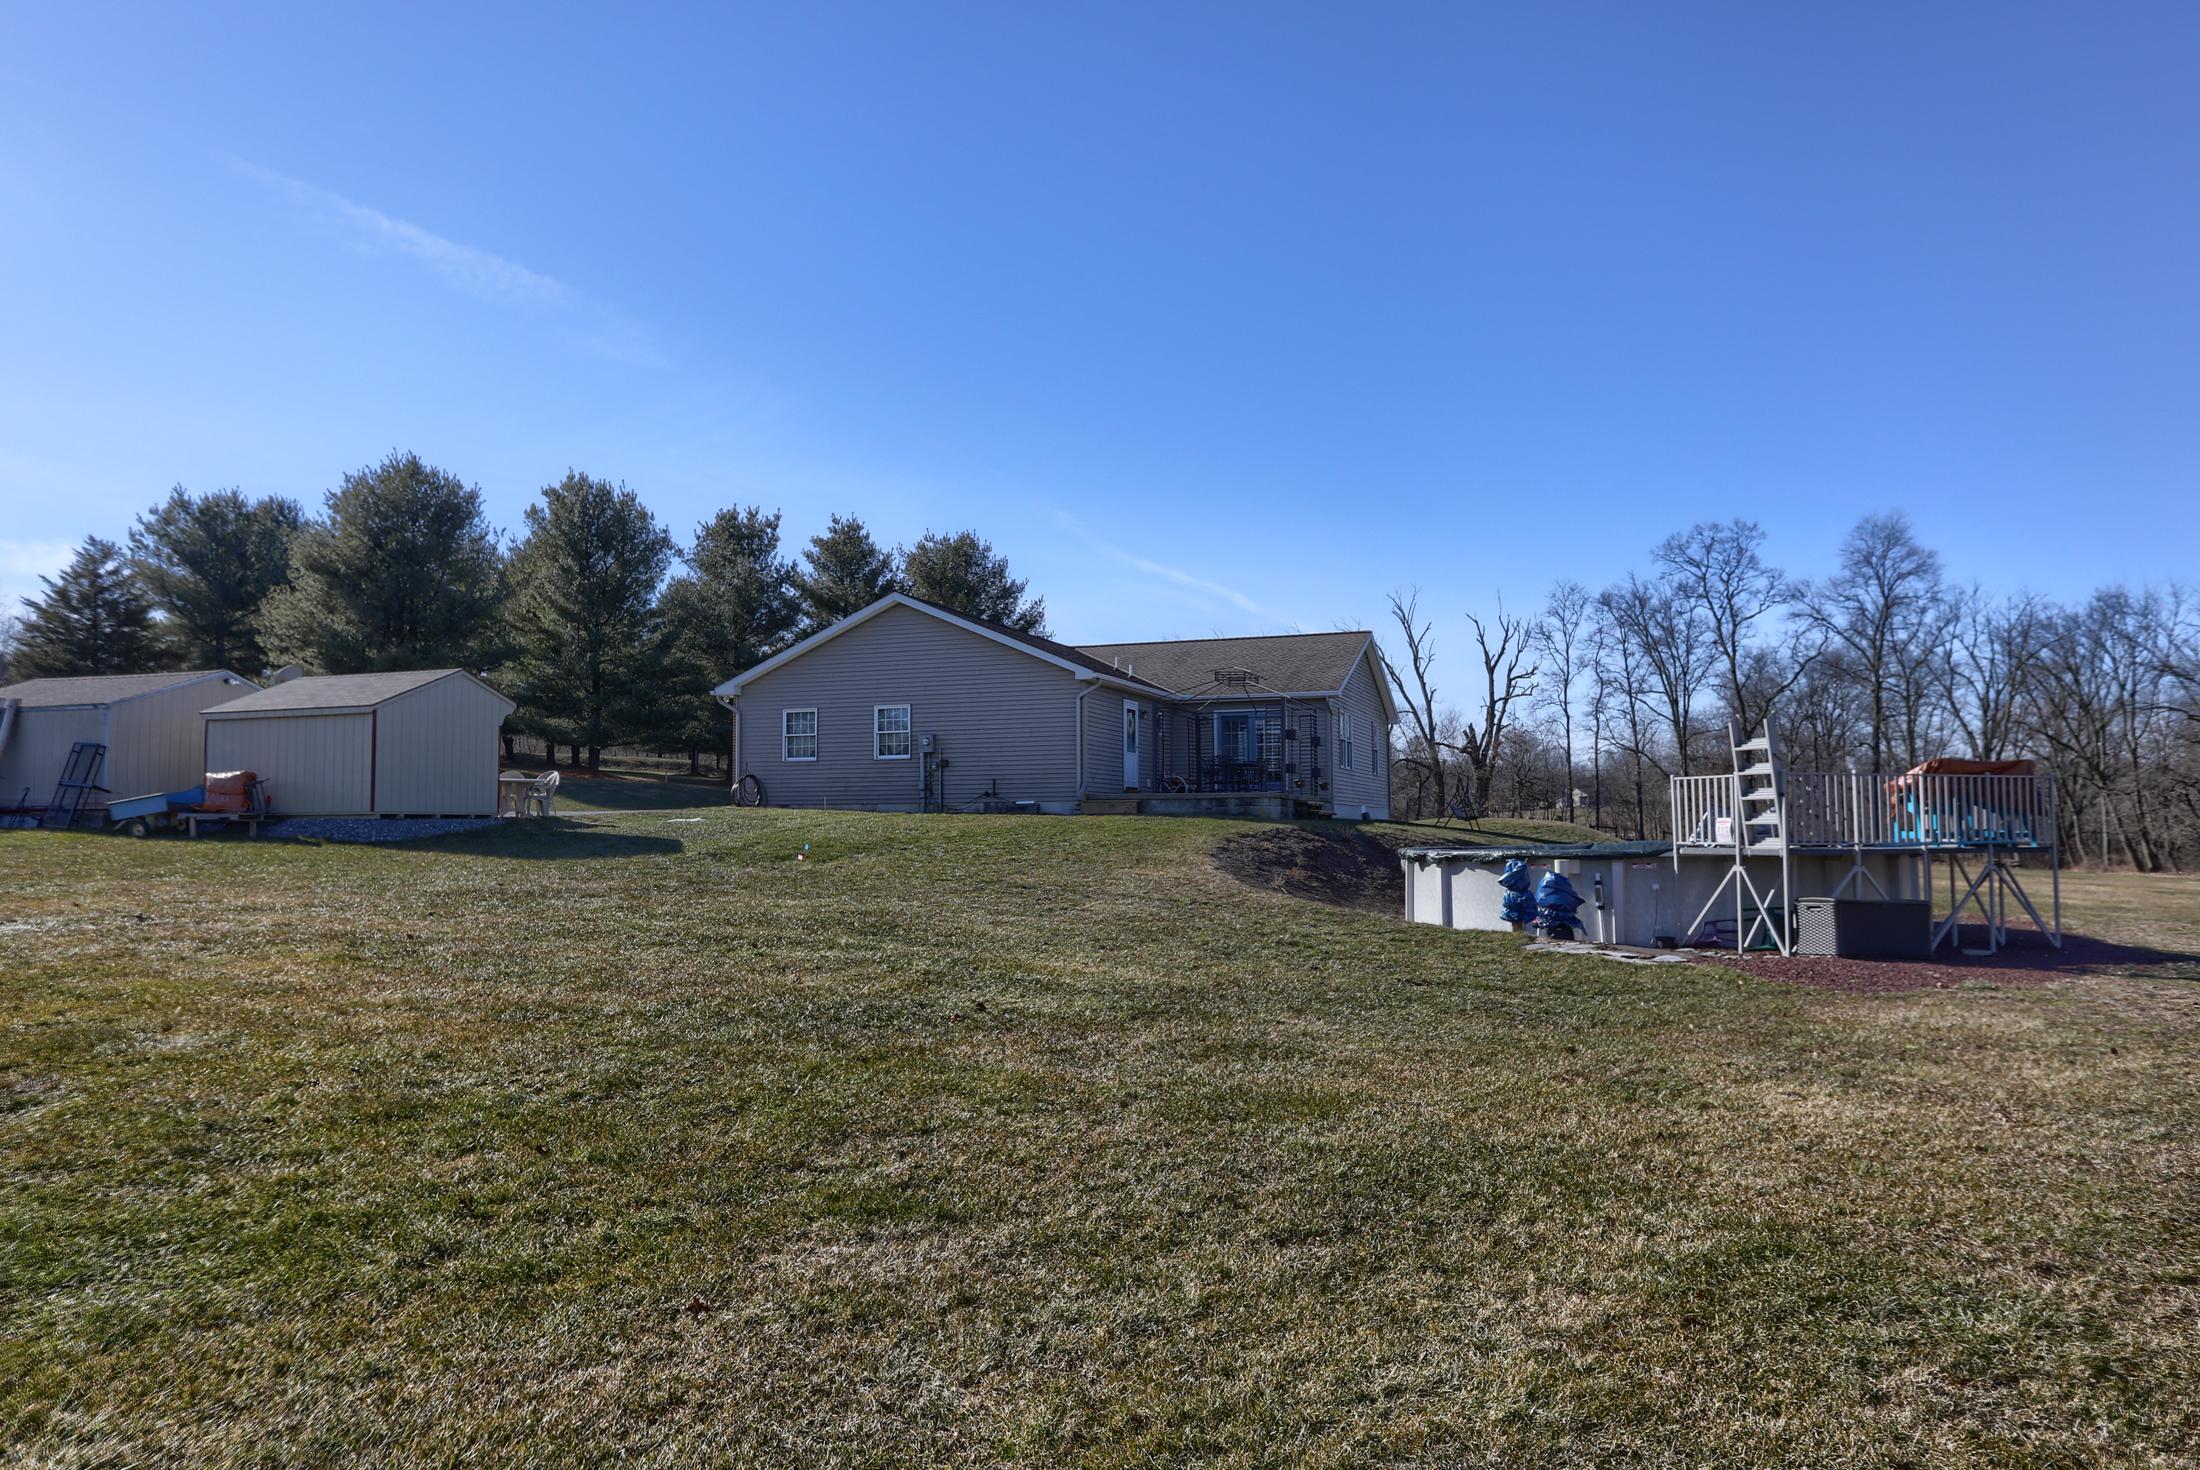 26 W. Strack Drive - yard and pool